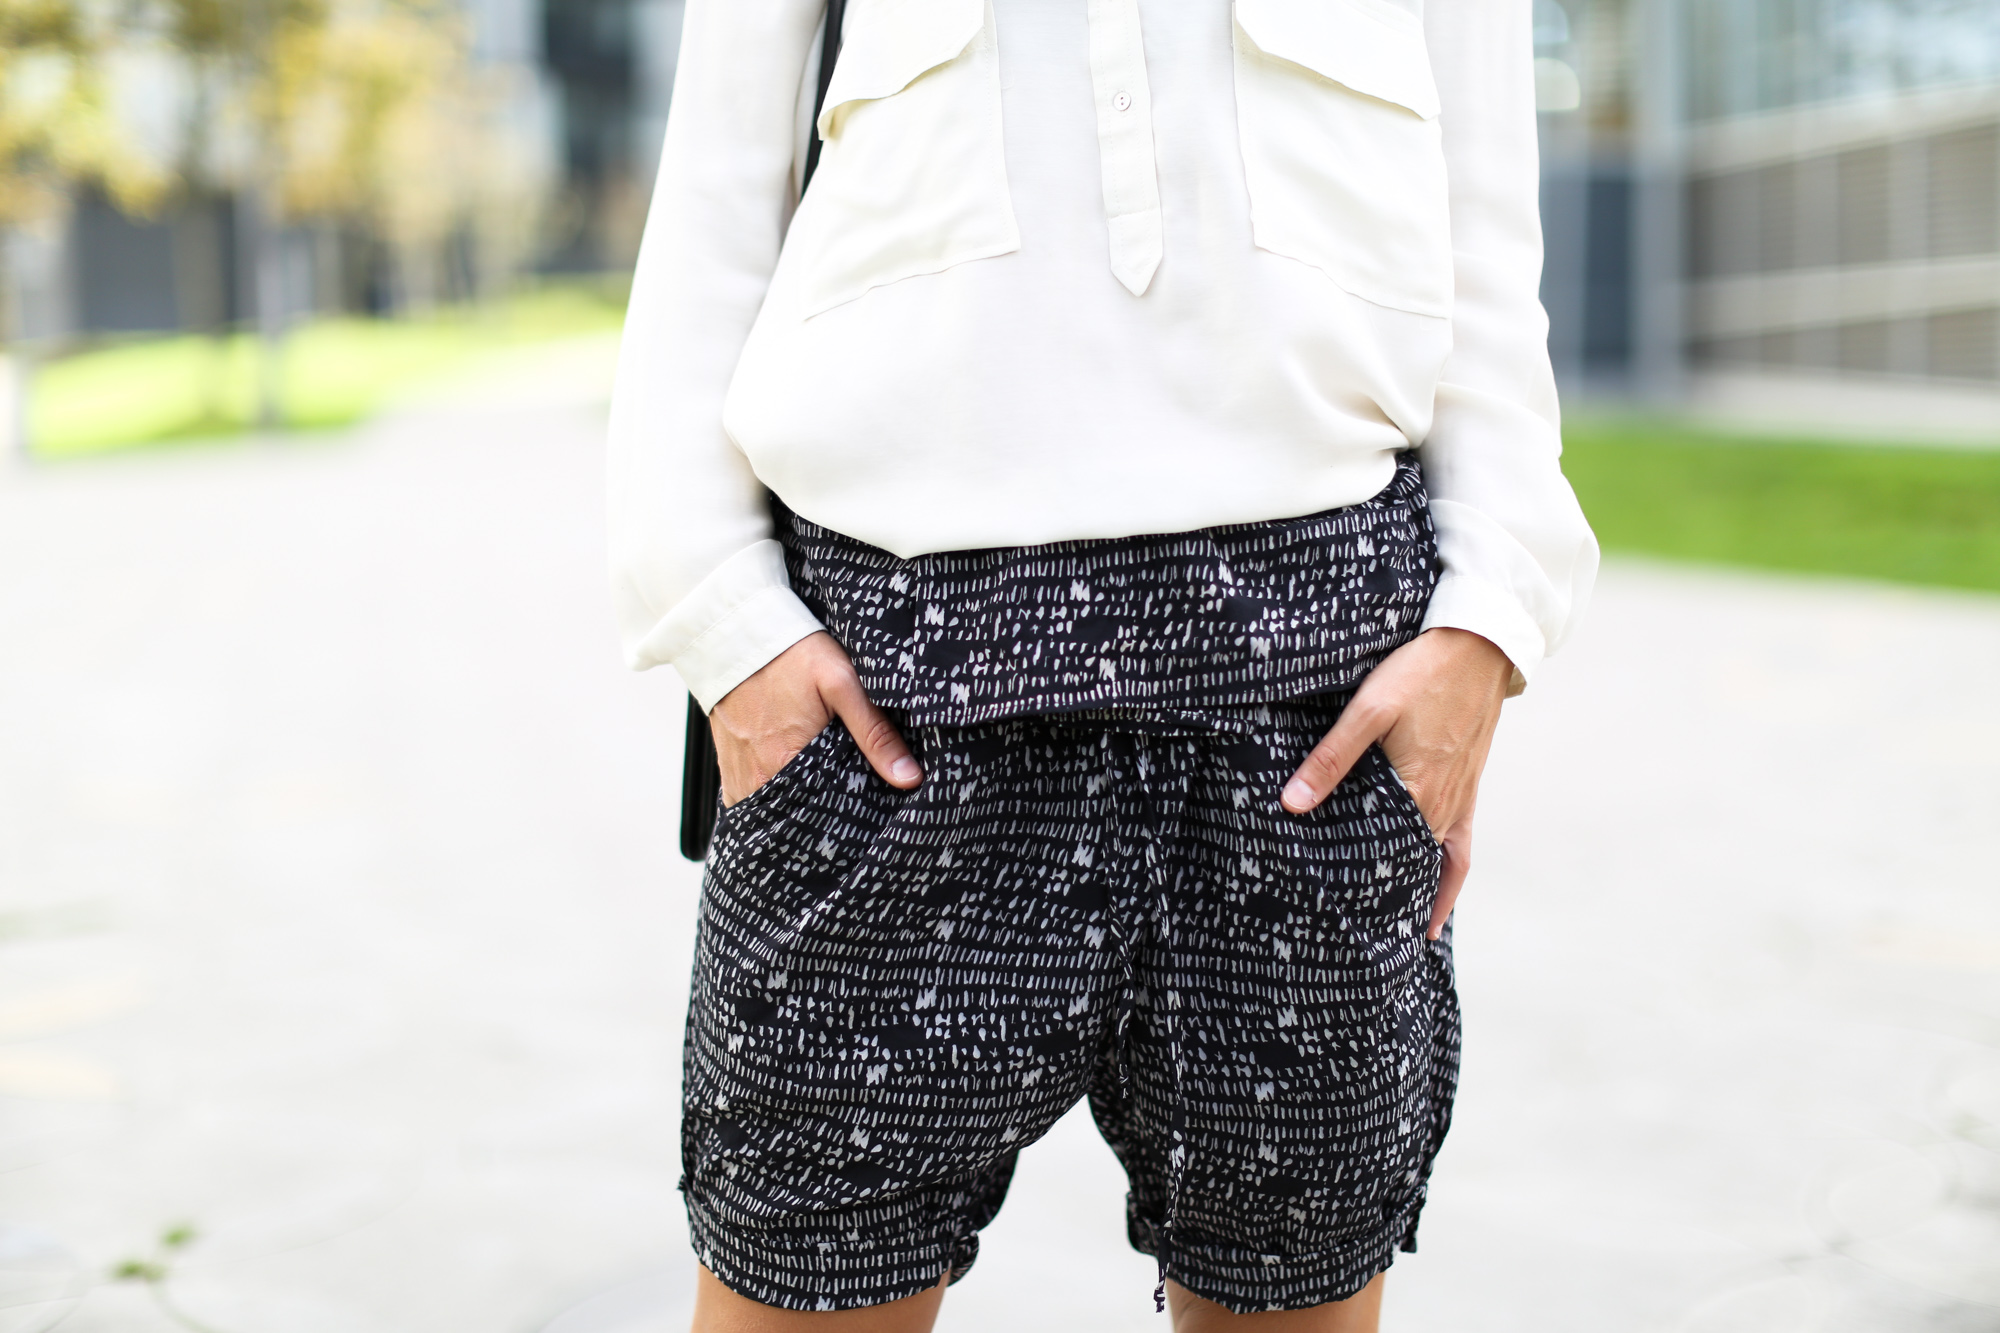 Clochet_streetstyle_theory_shorts_celine_trio_bag-8